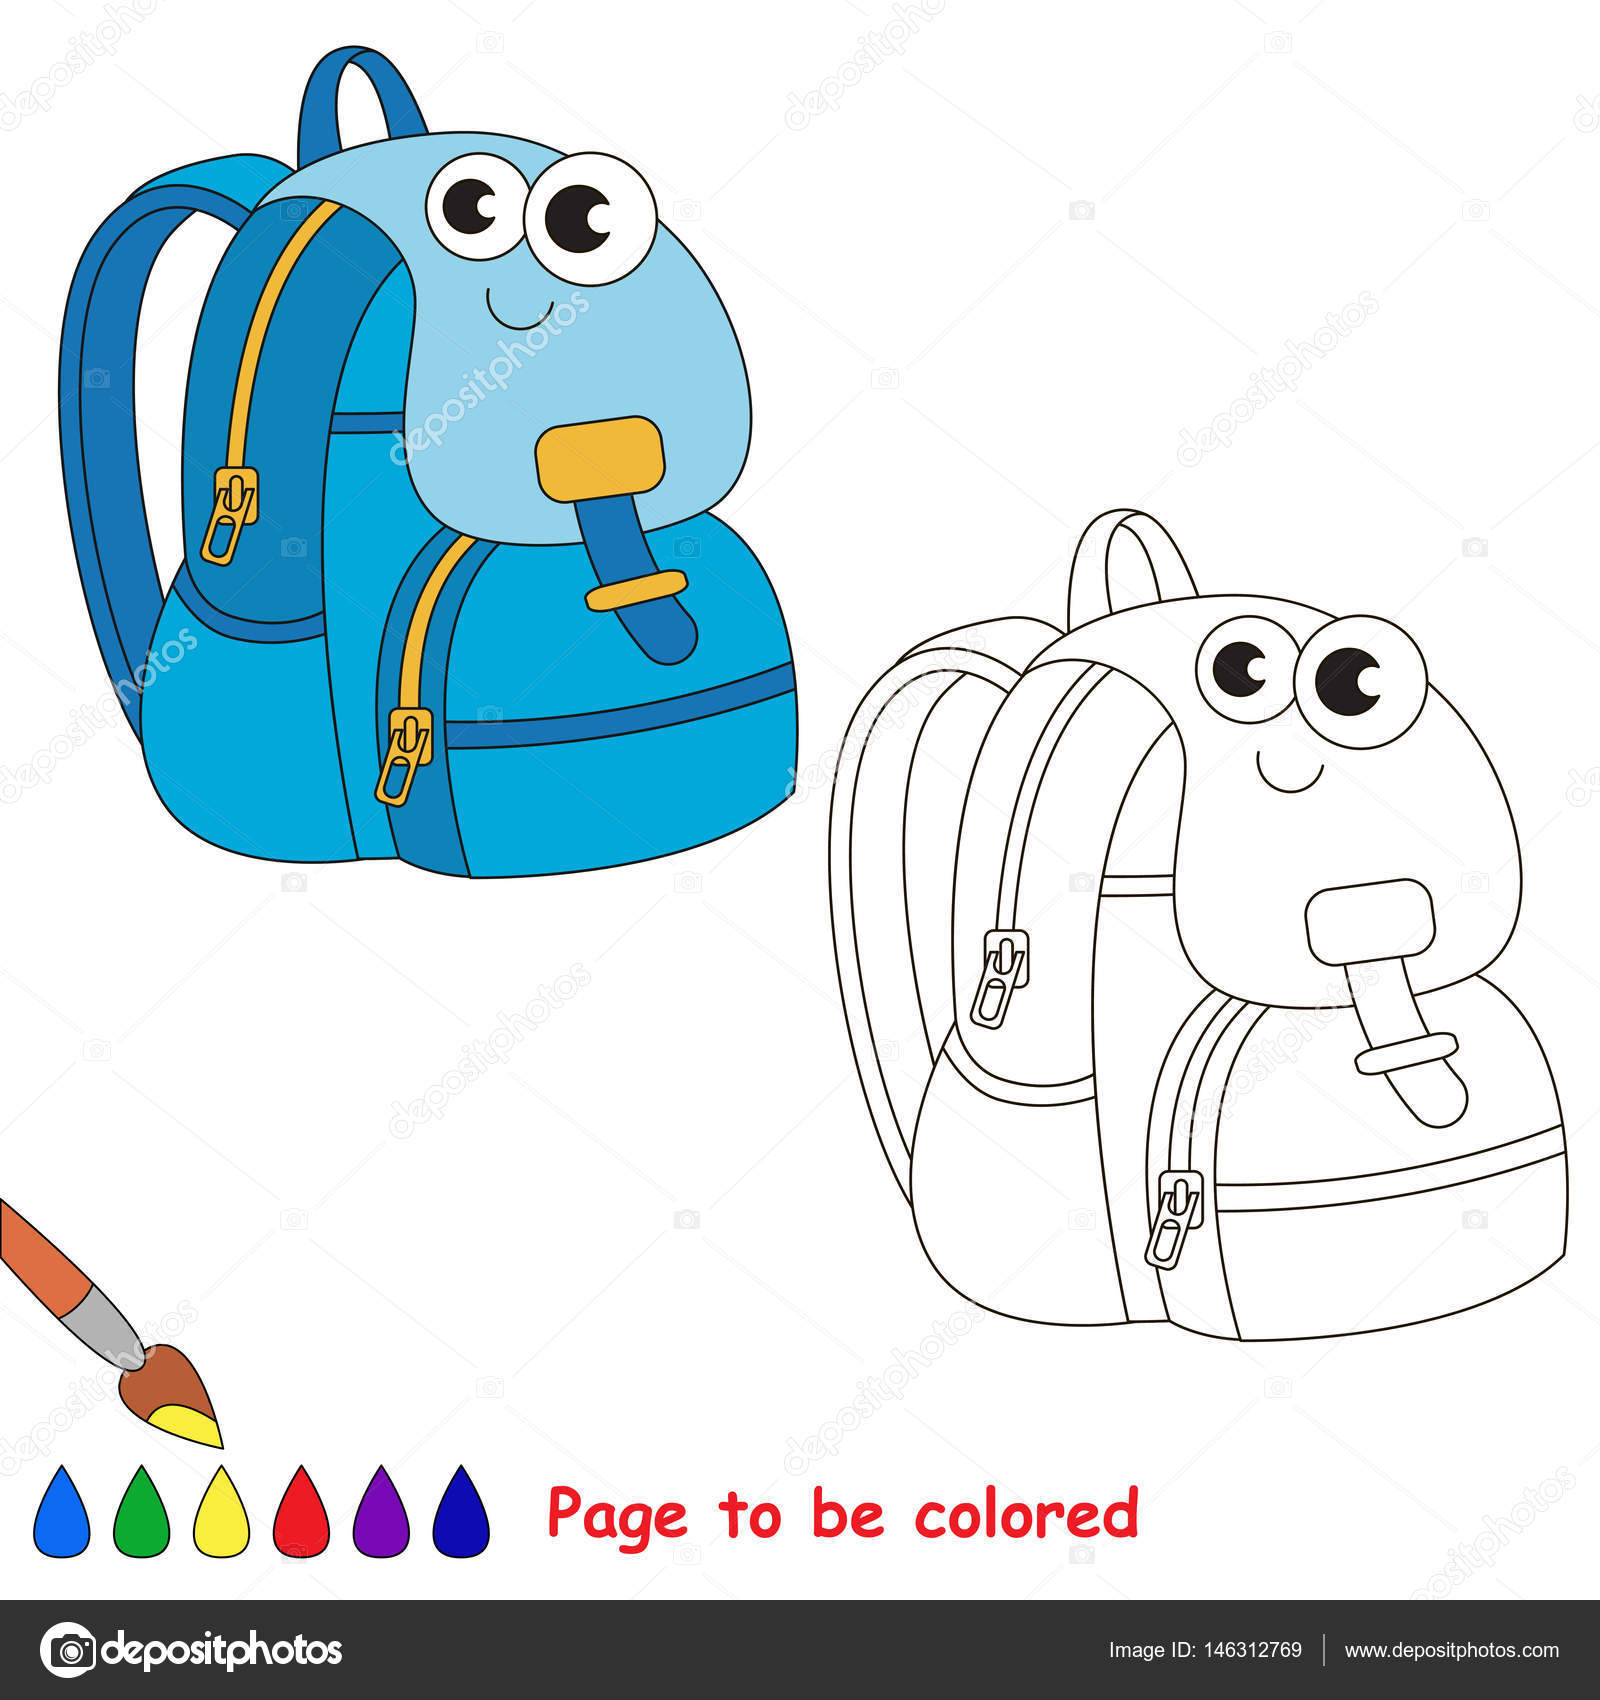 Okul öğeleri Karikatür Renkli Sayfa Stok Vektör Annamikhailova